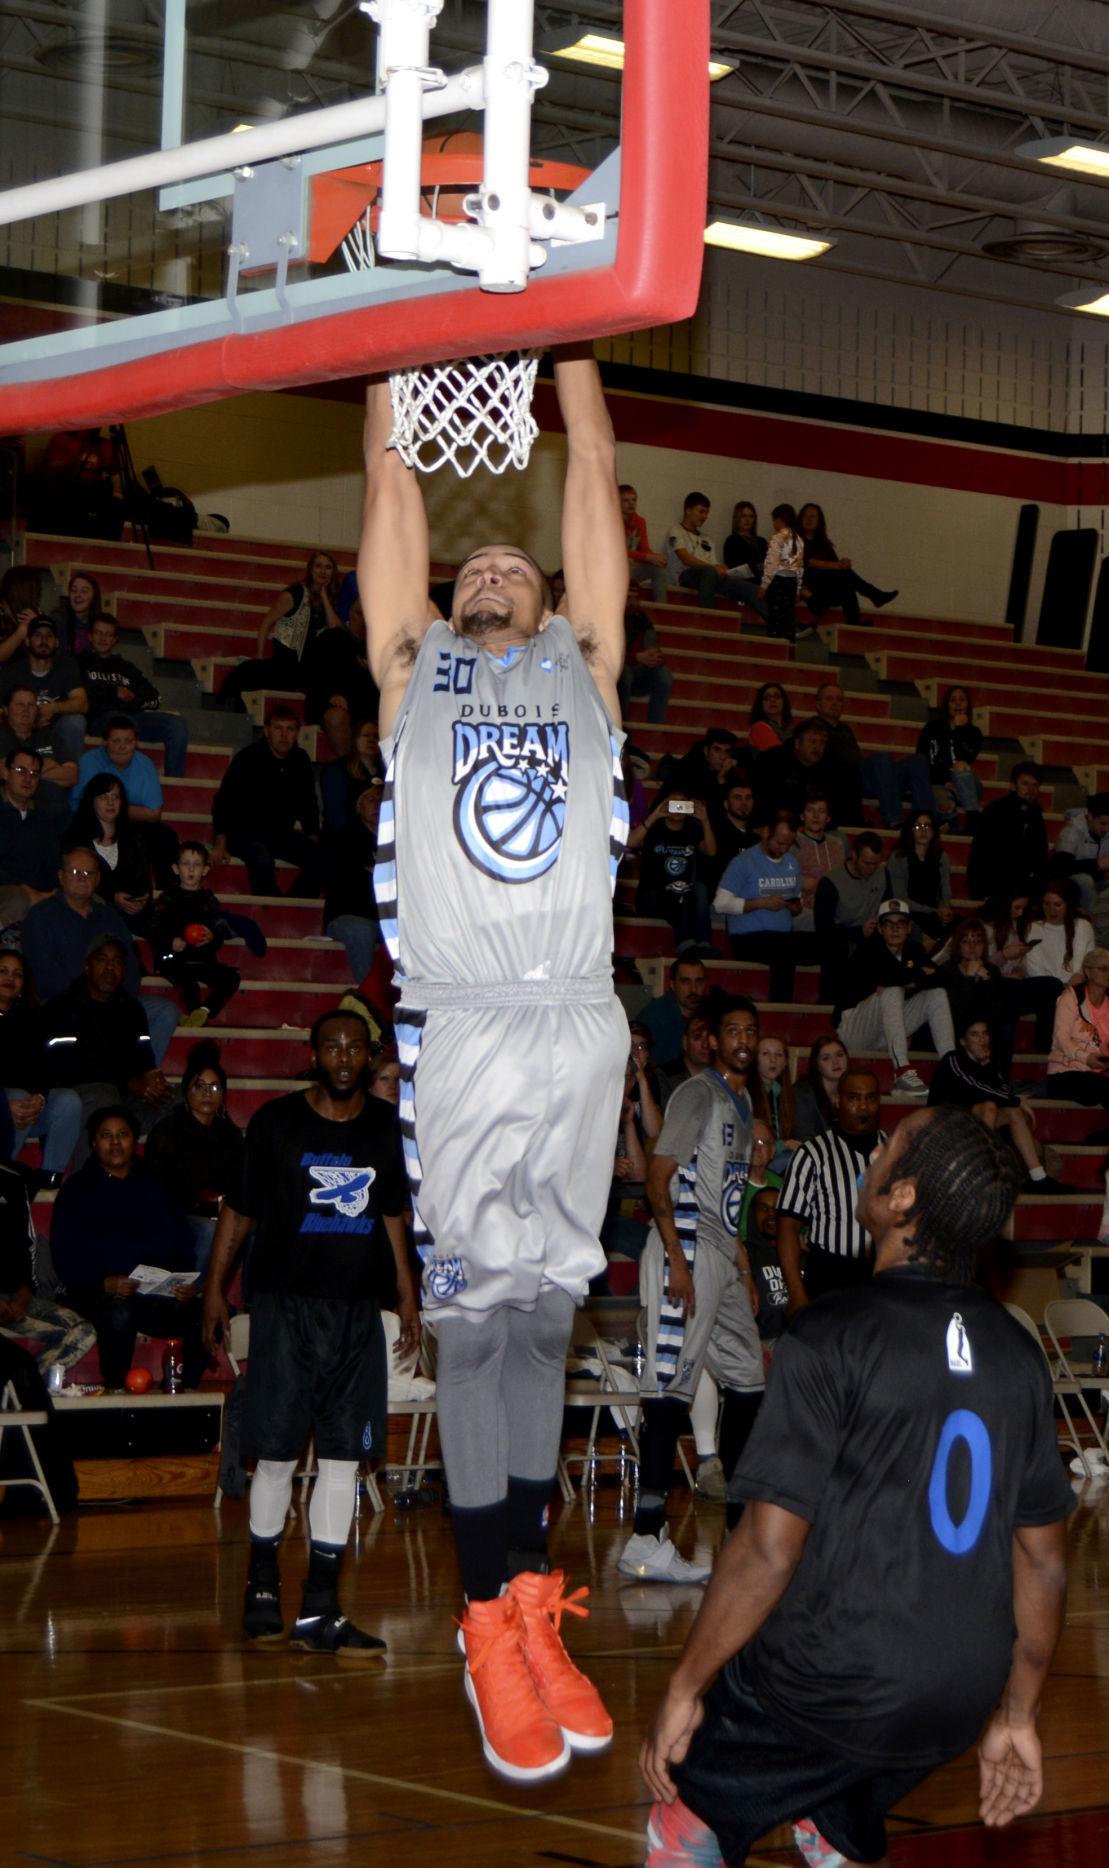 Johnson dunk